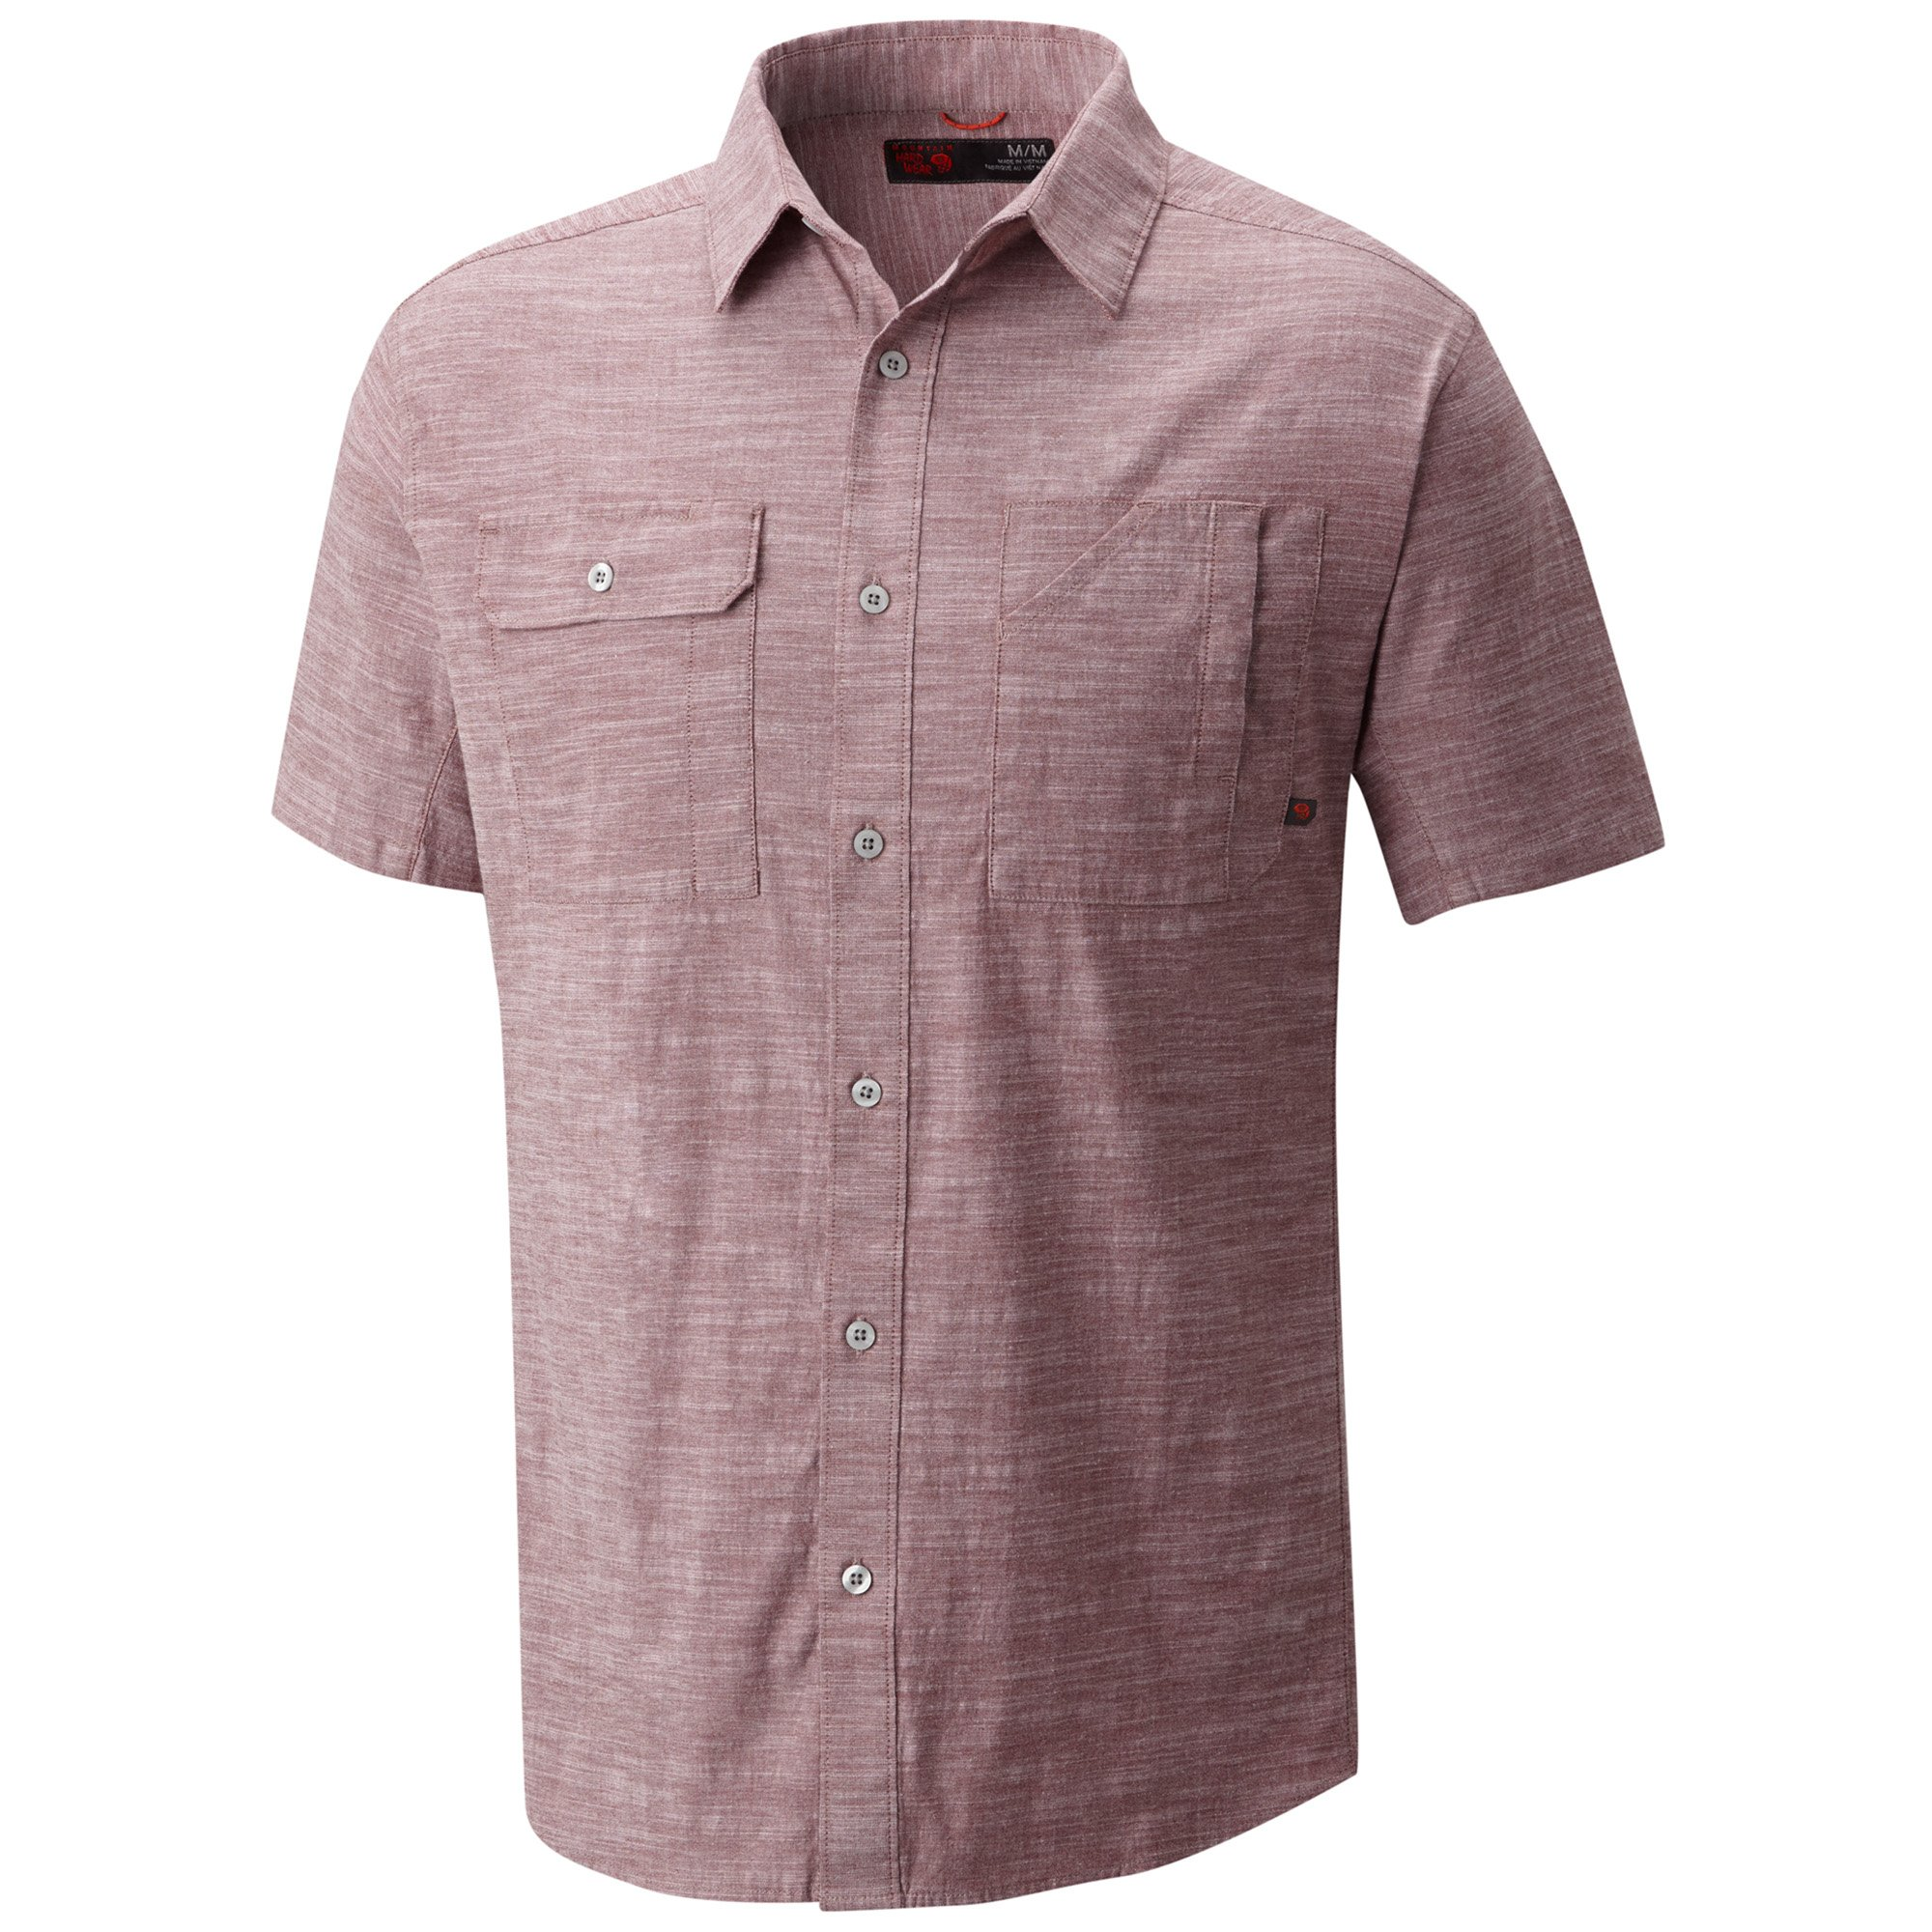 Mountain Hardwear Men's Outpost Short Sleeve Shirt, Smith Rock, M